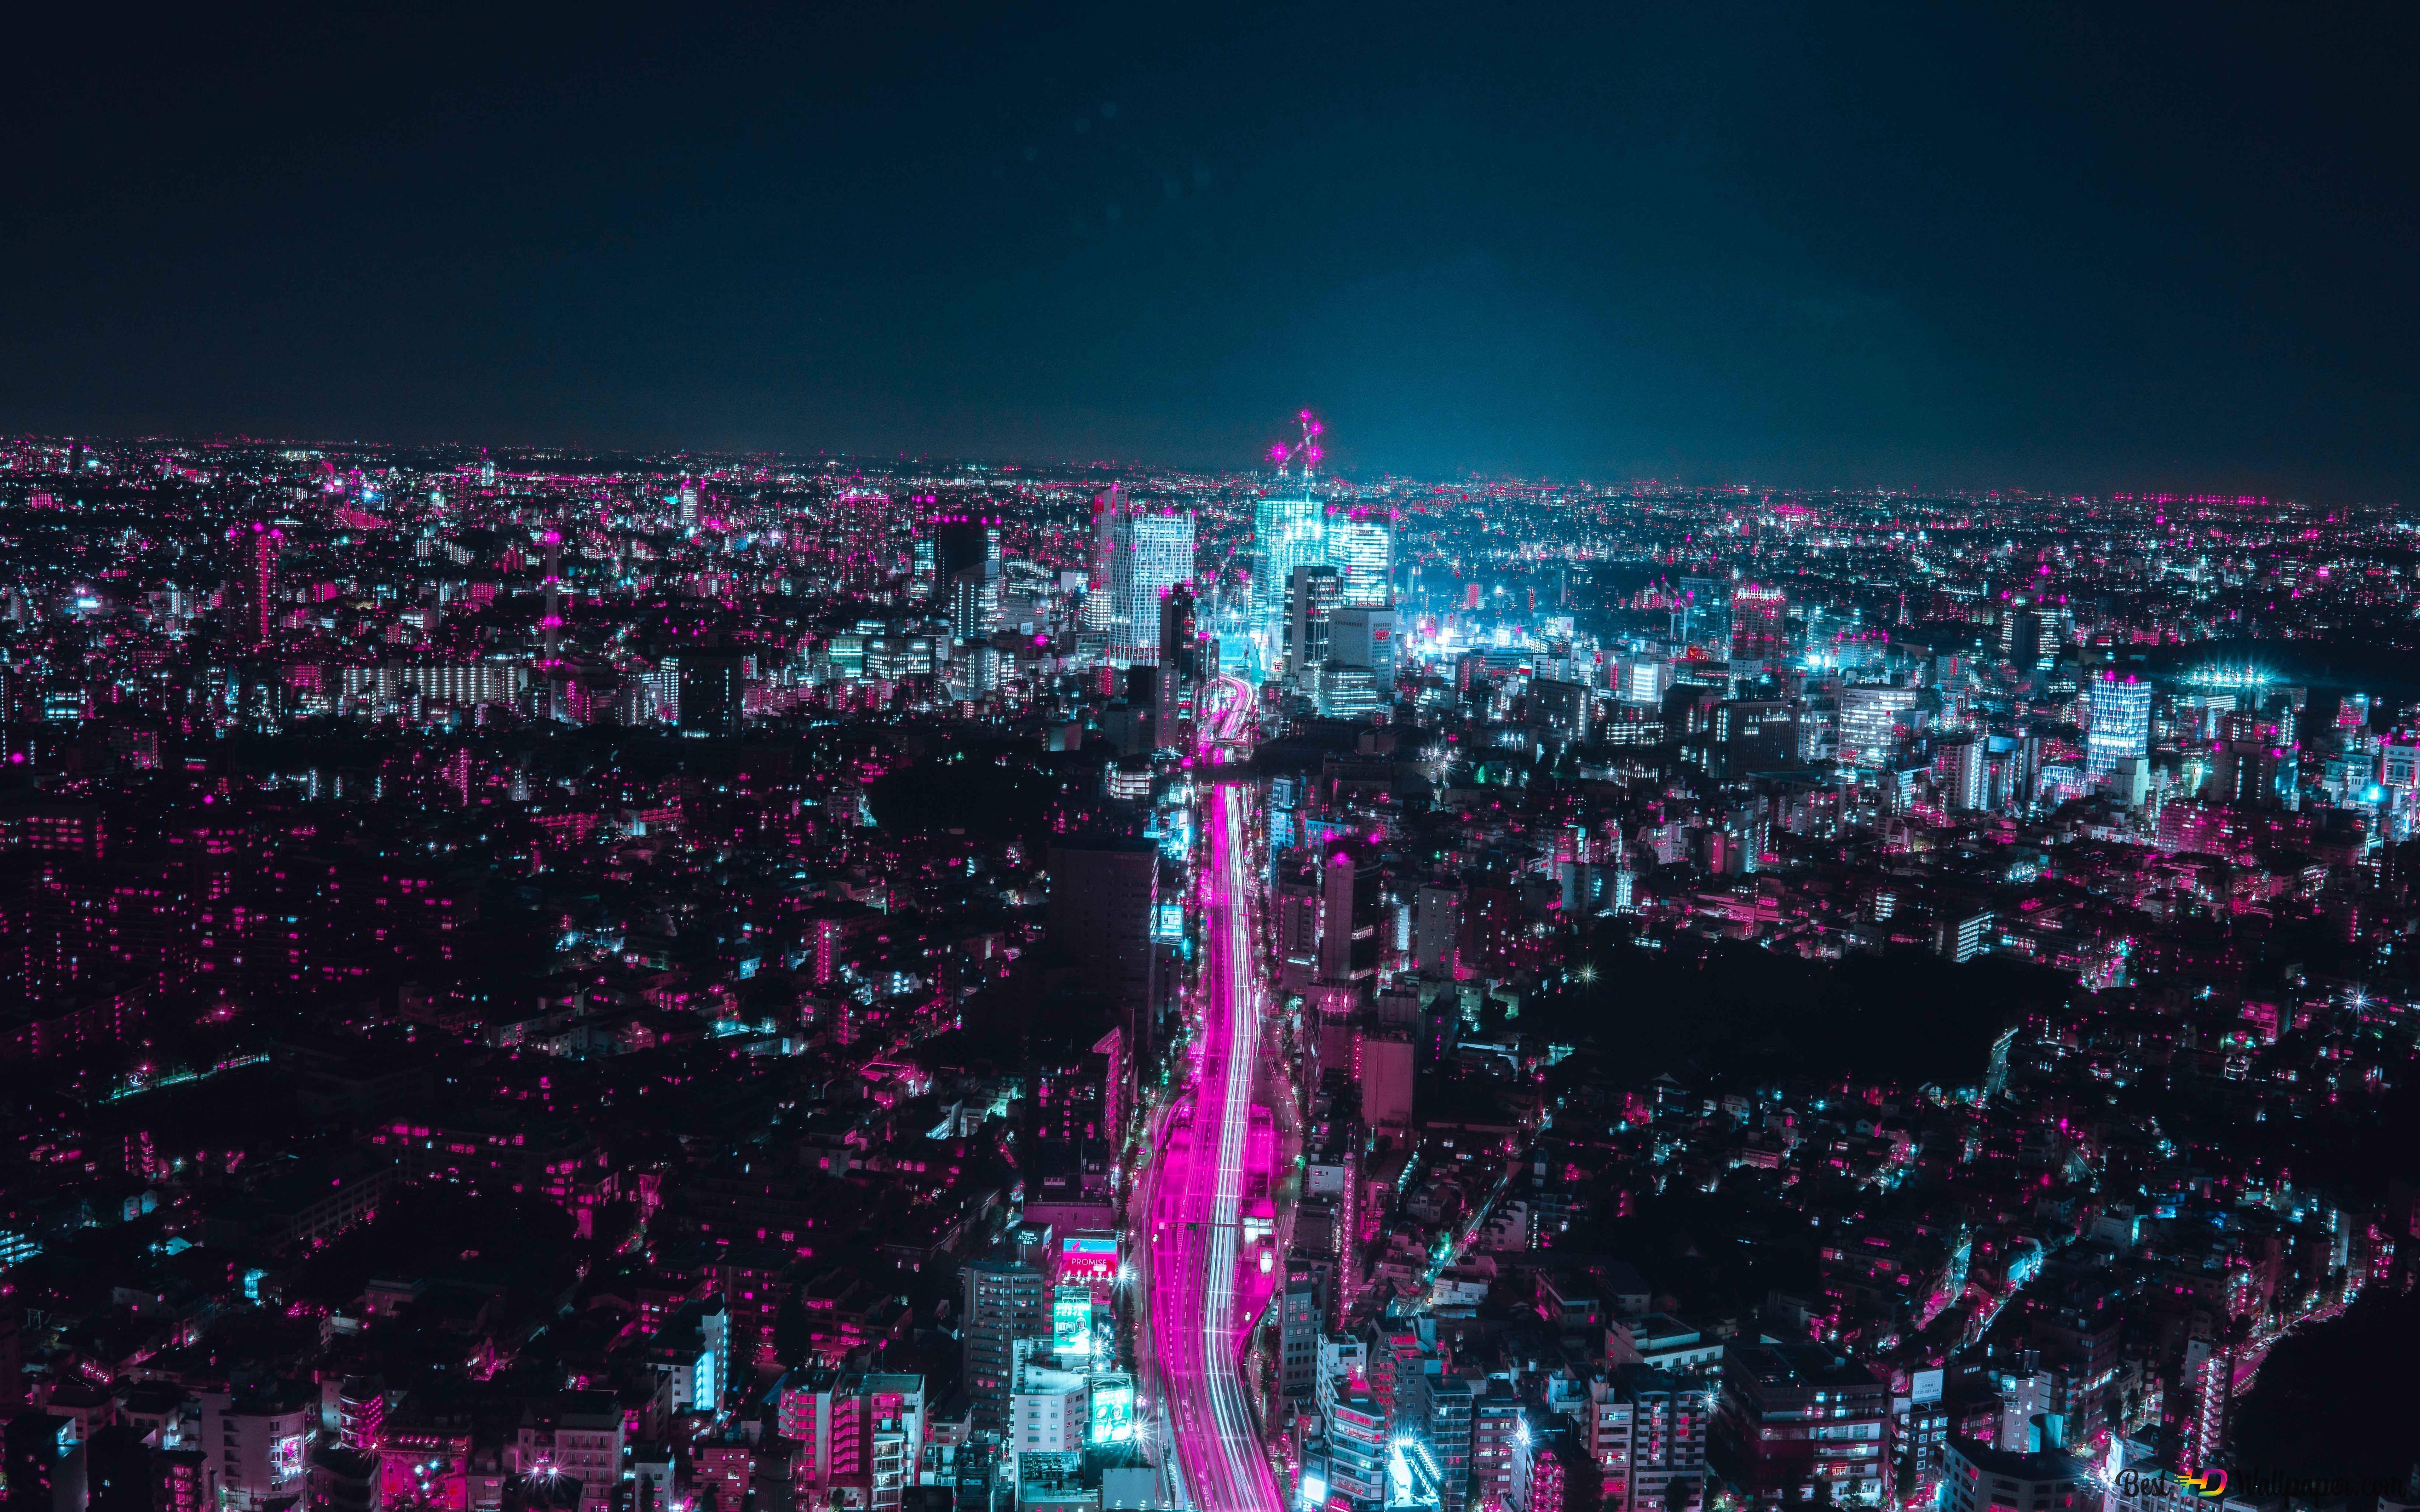 Japan Osaka 8k HD wallpaper download